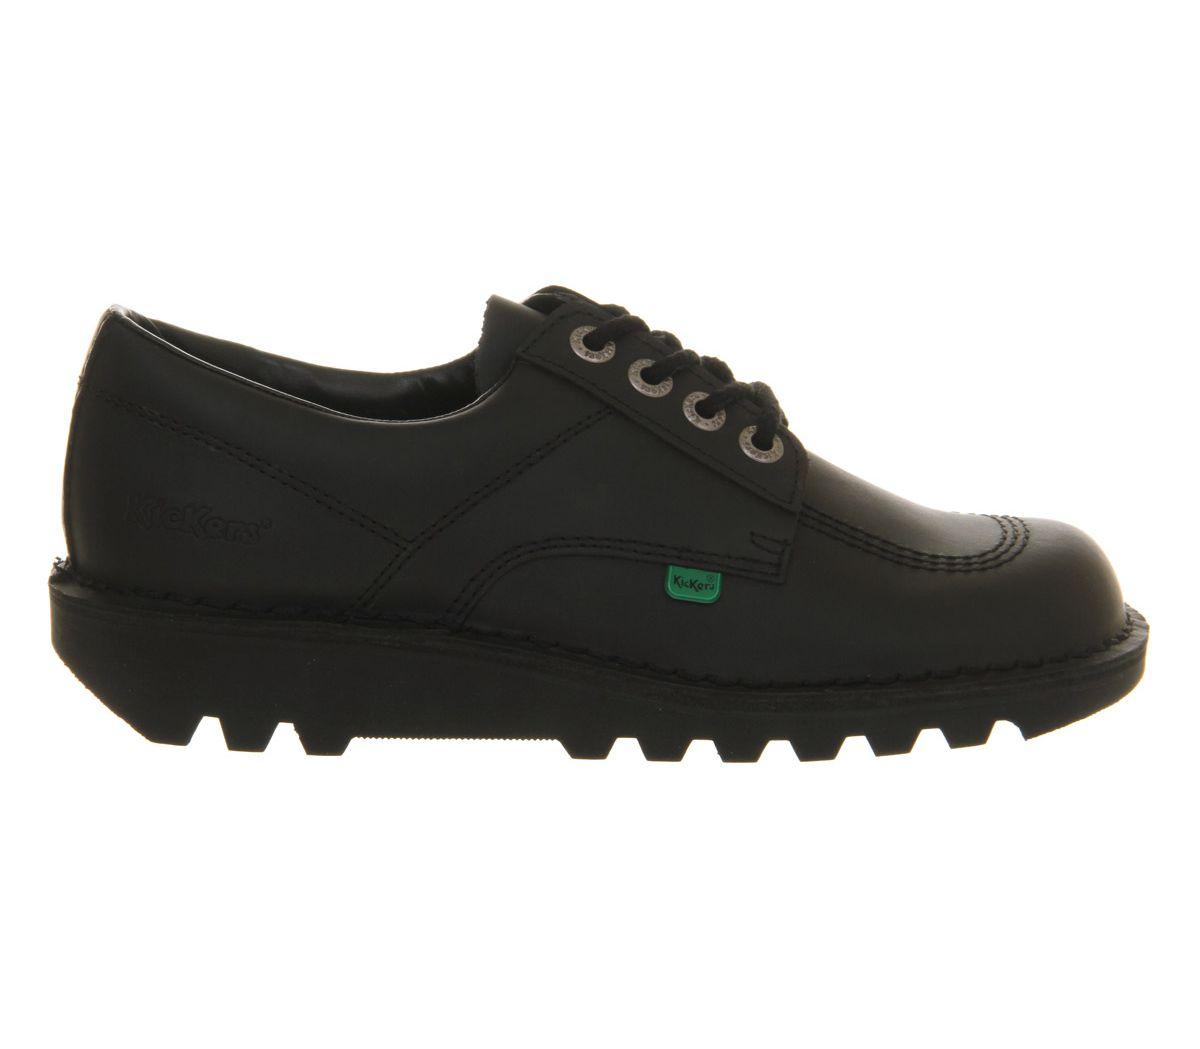 thumbnail 4 - Mens Kickers Kick Lo M Black Leather Formal Shoes